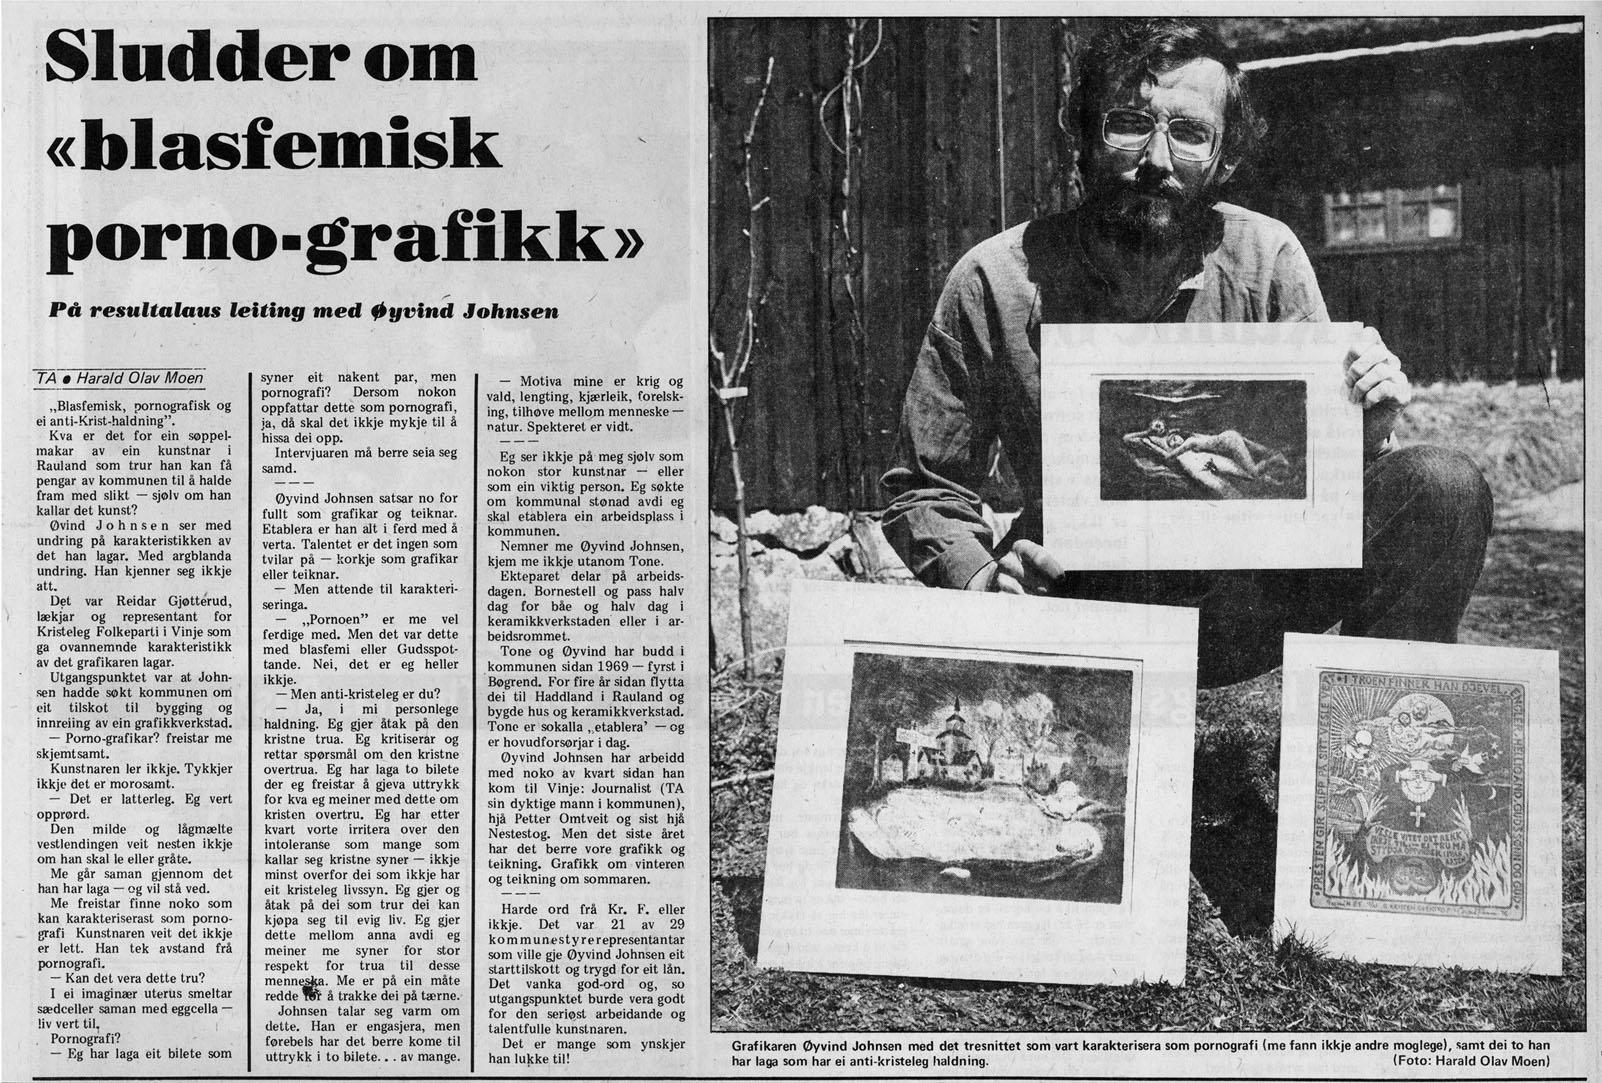 ny 1978 newspaper article TA